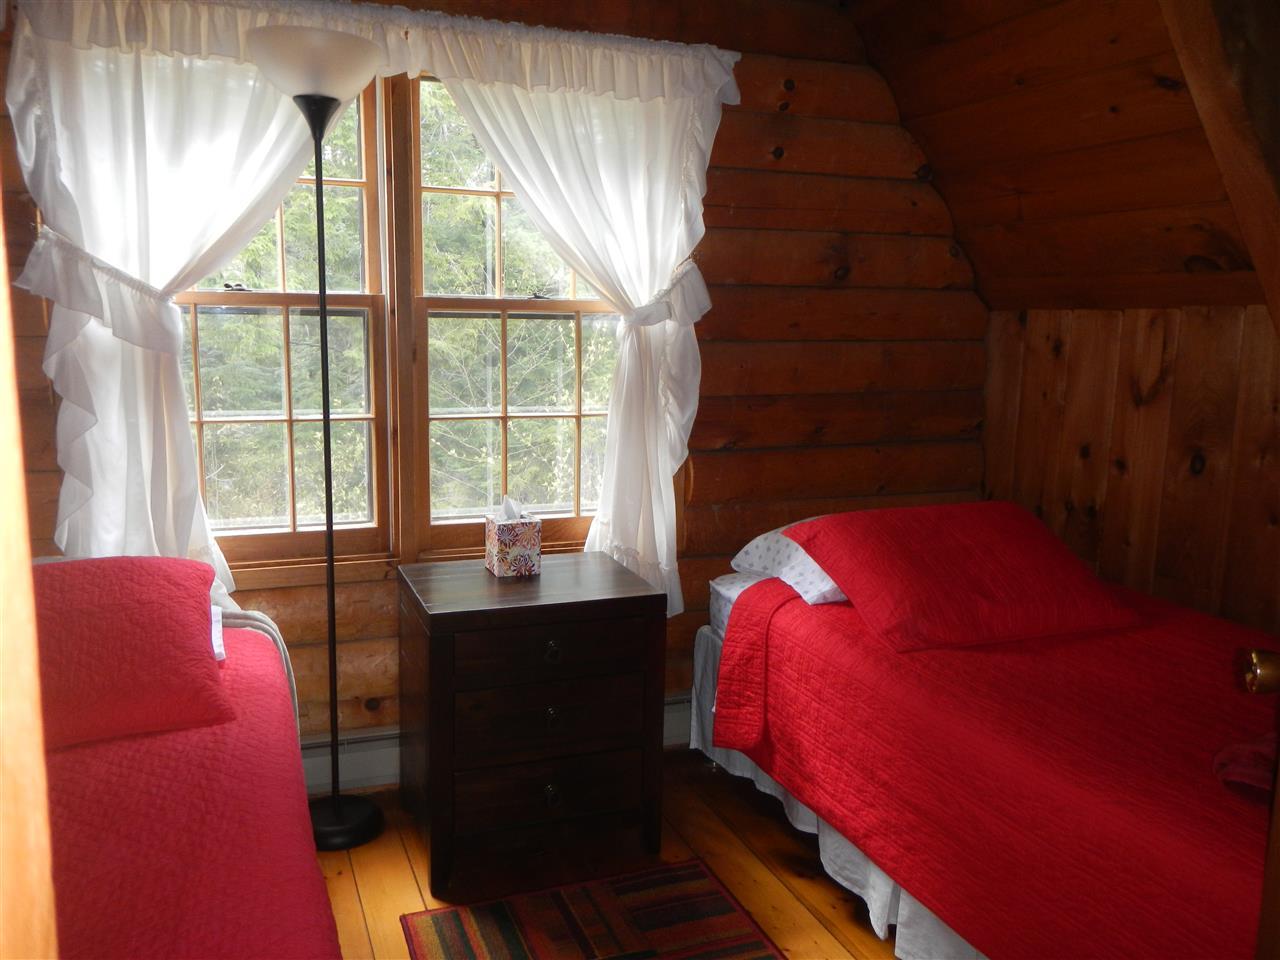 Mount-Snow-Real-Estate-4633923-11